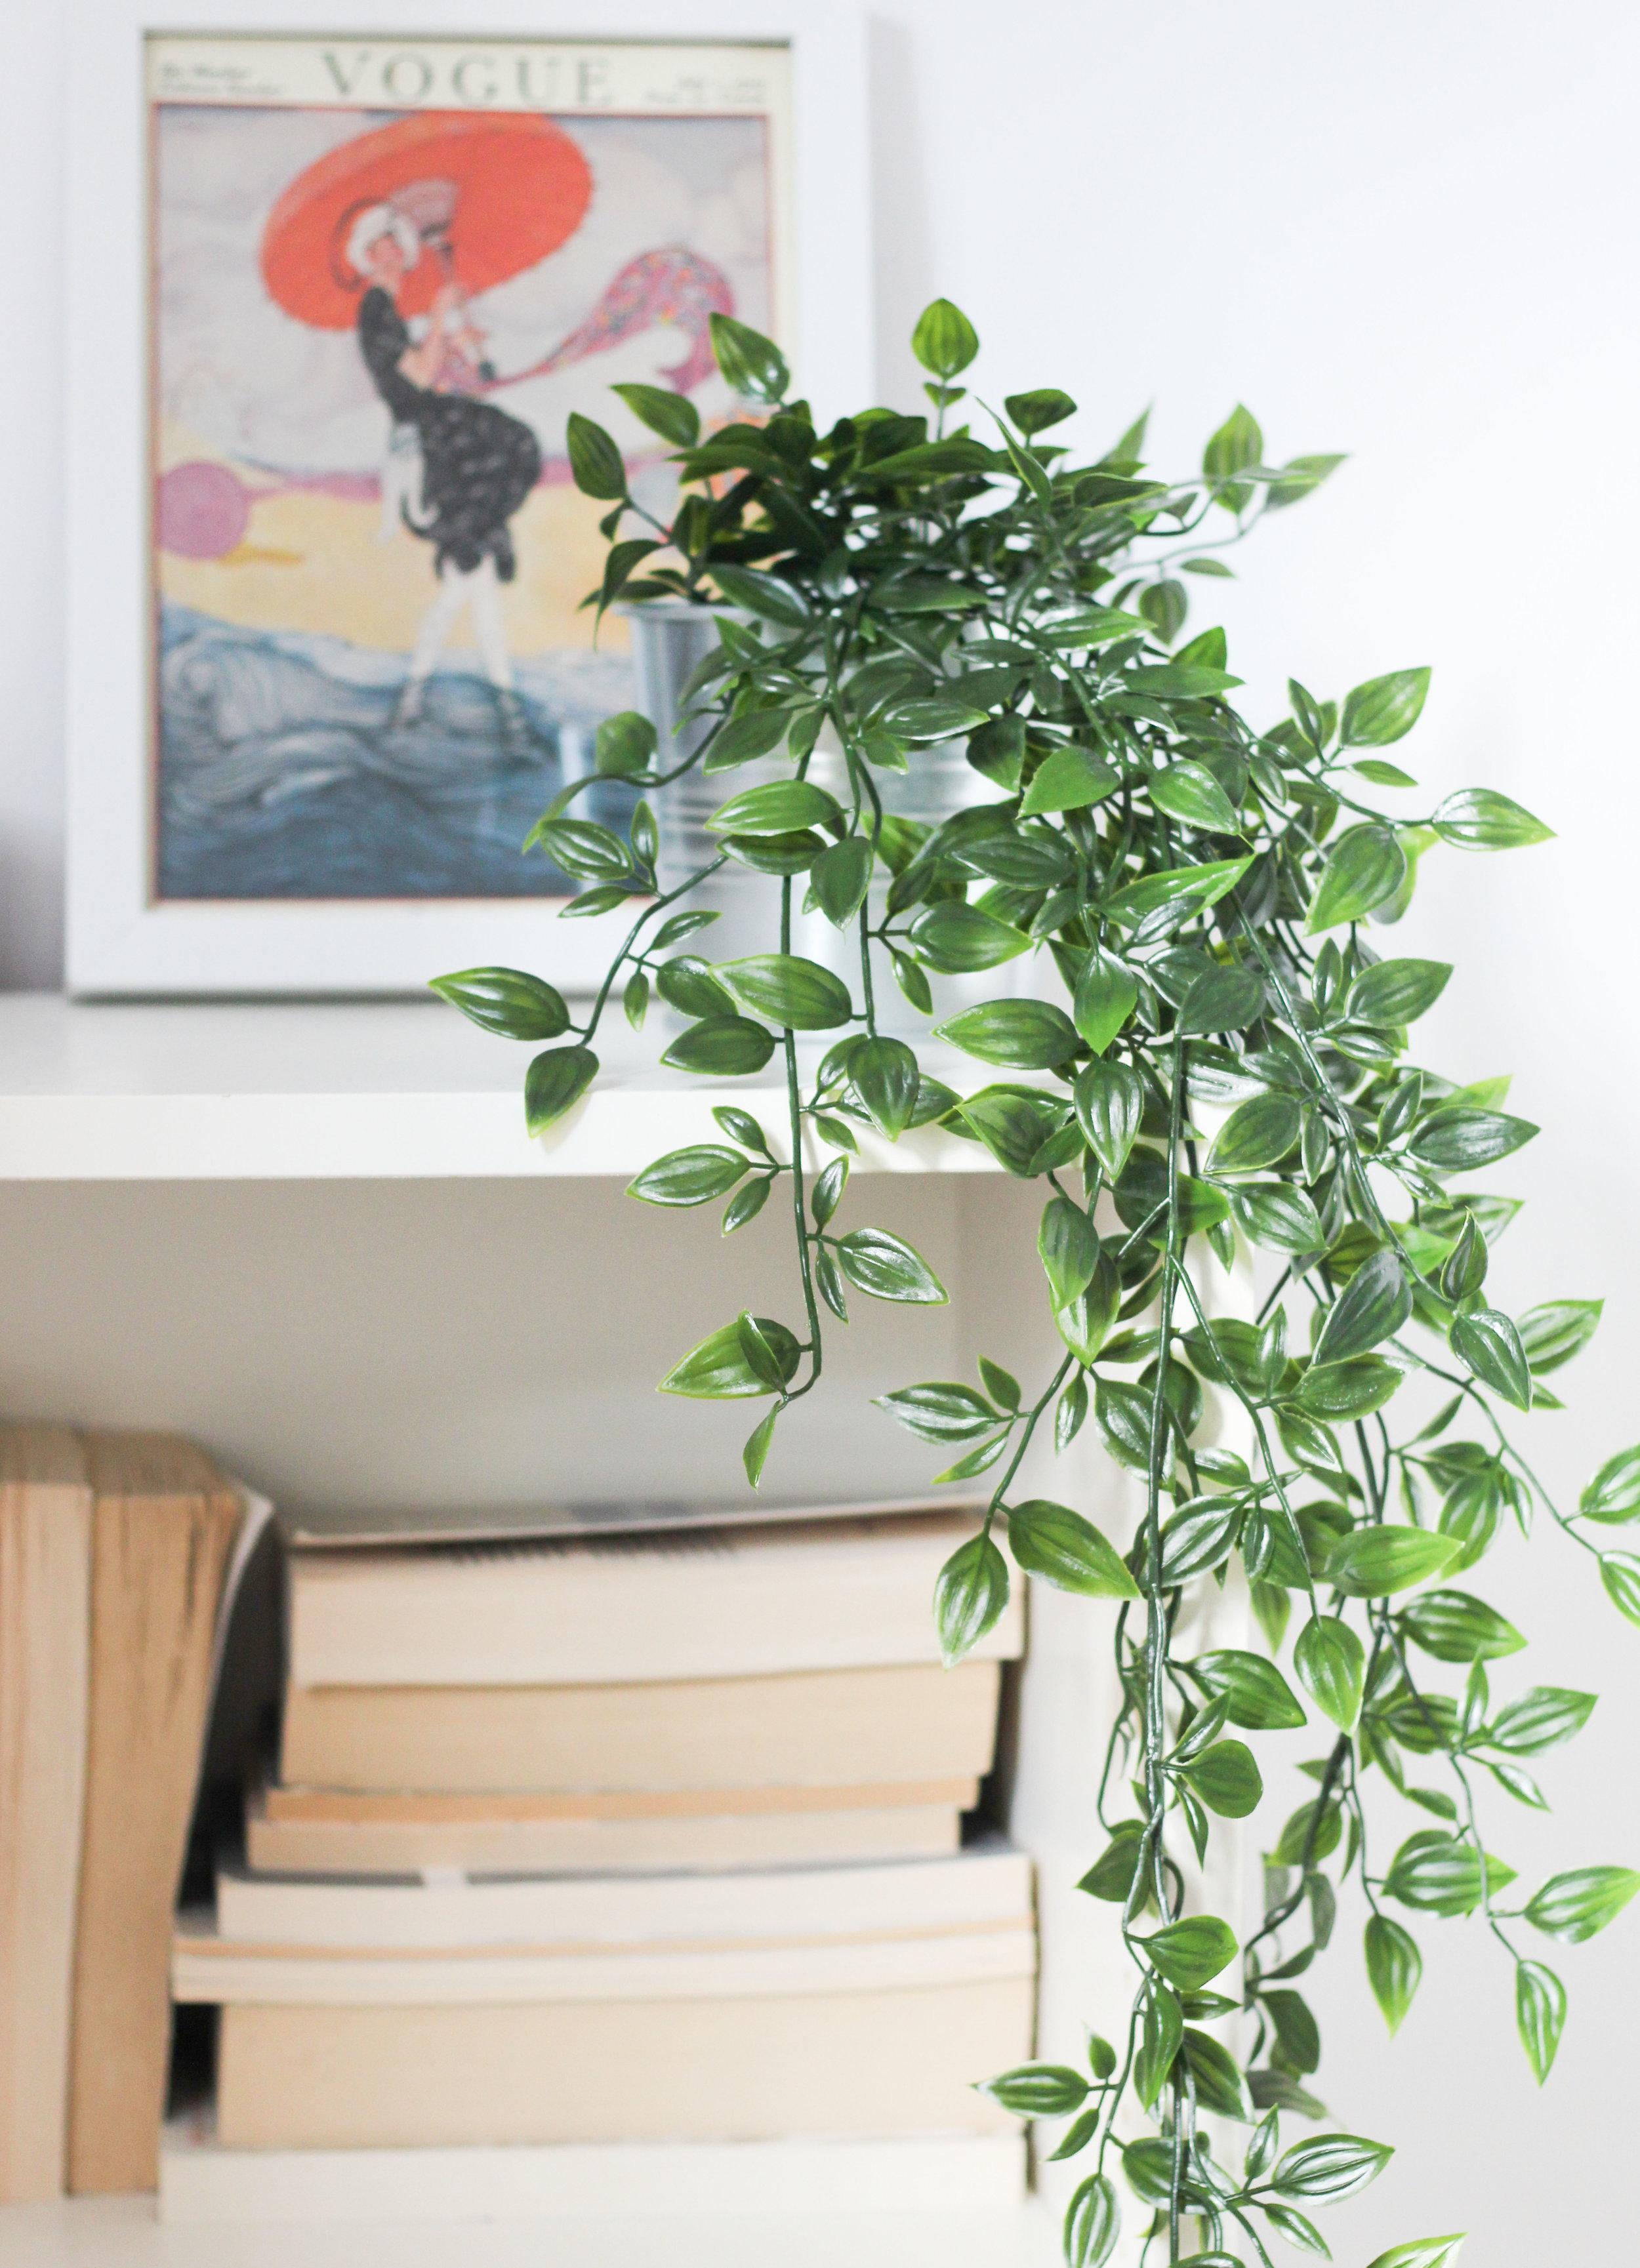 bookshelf_plant.jpg